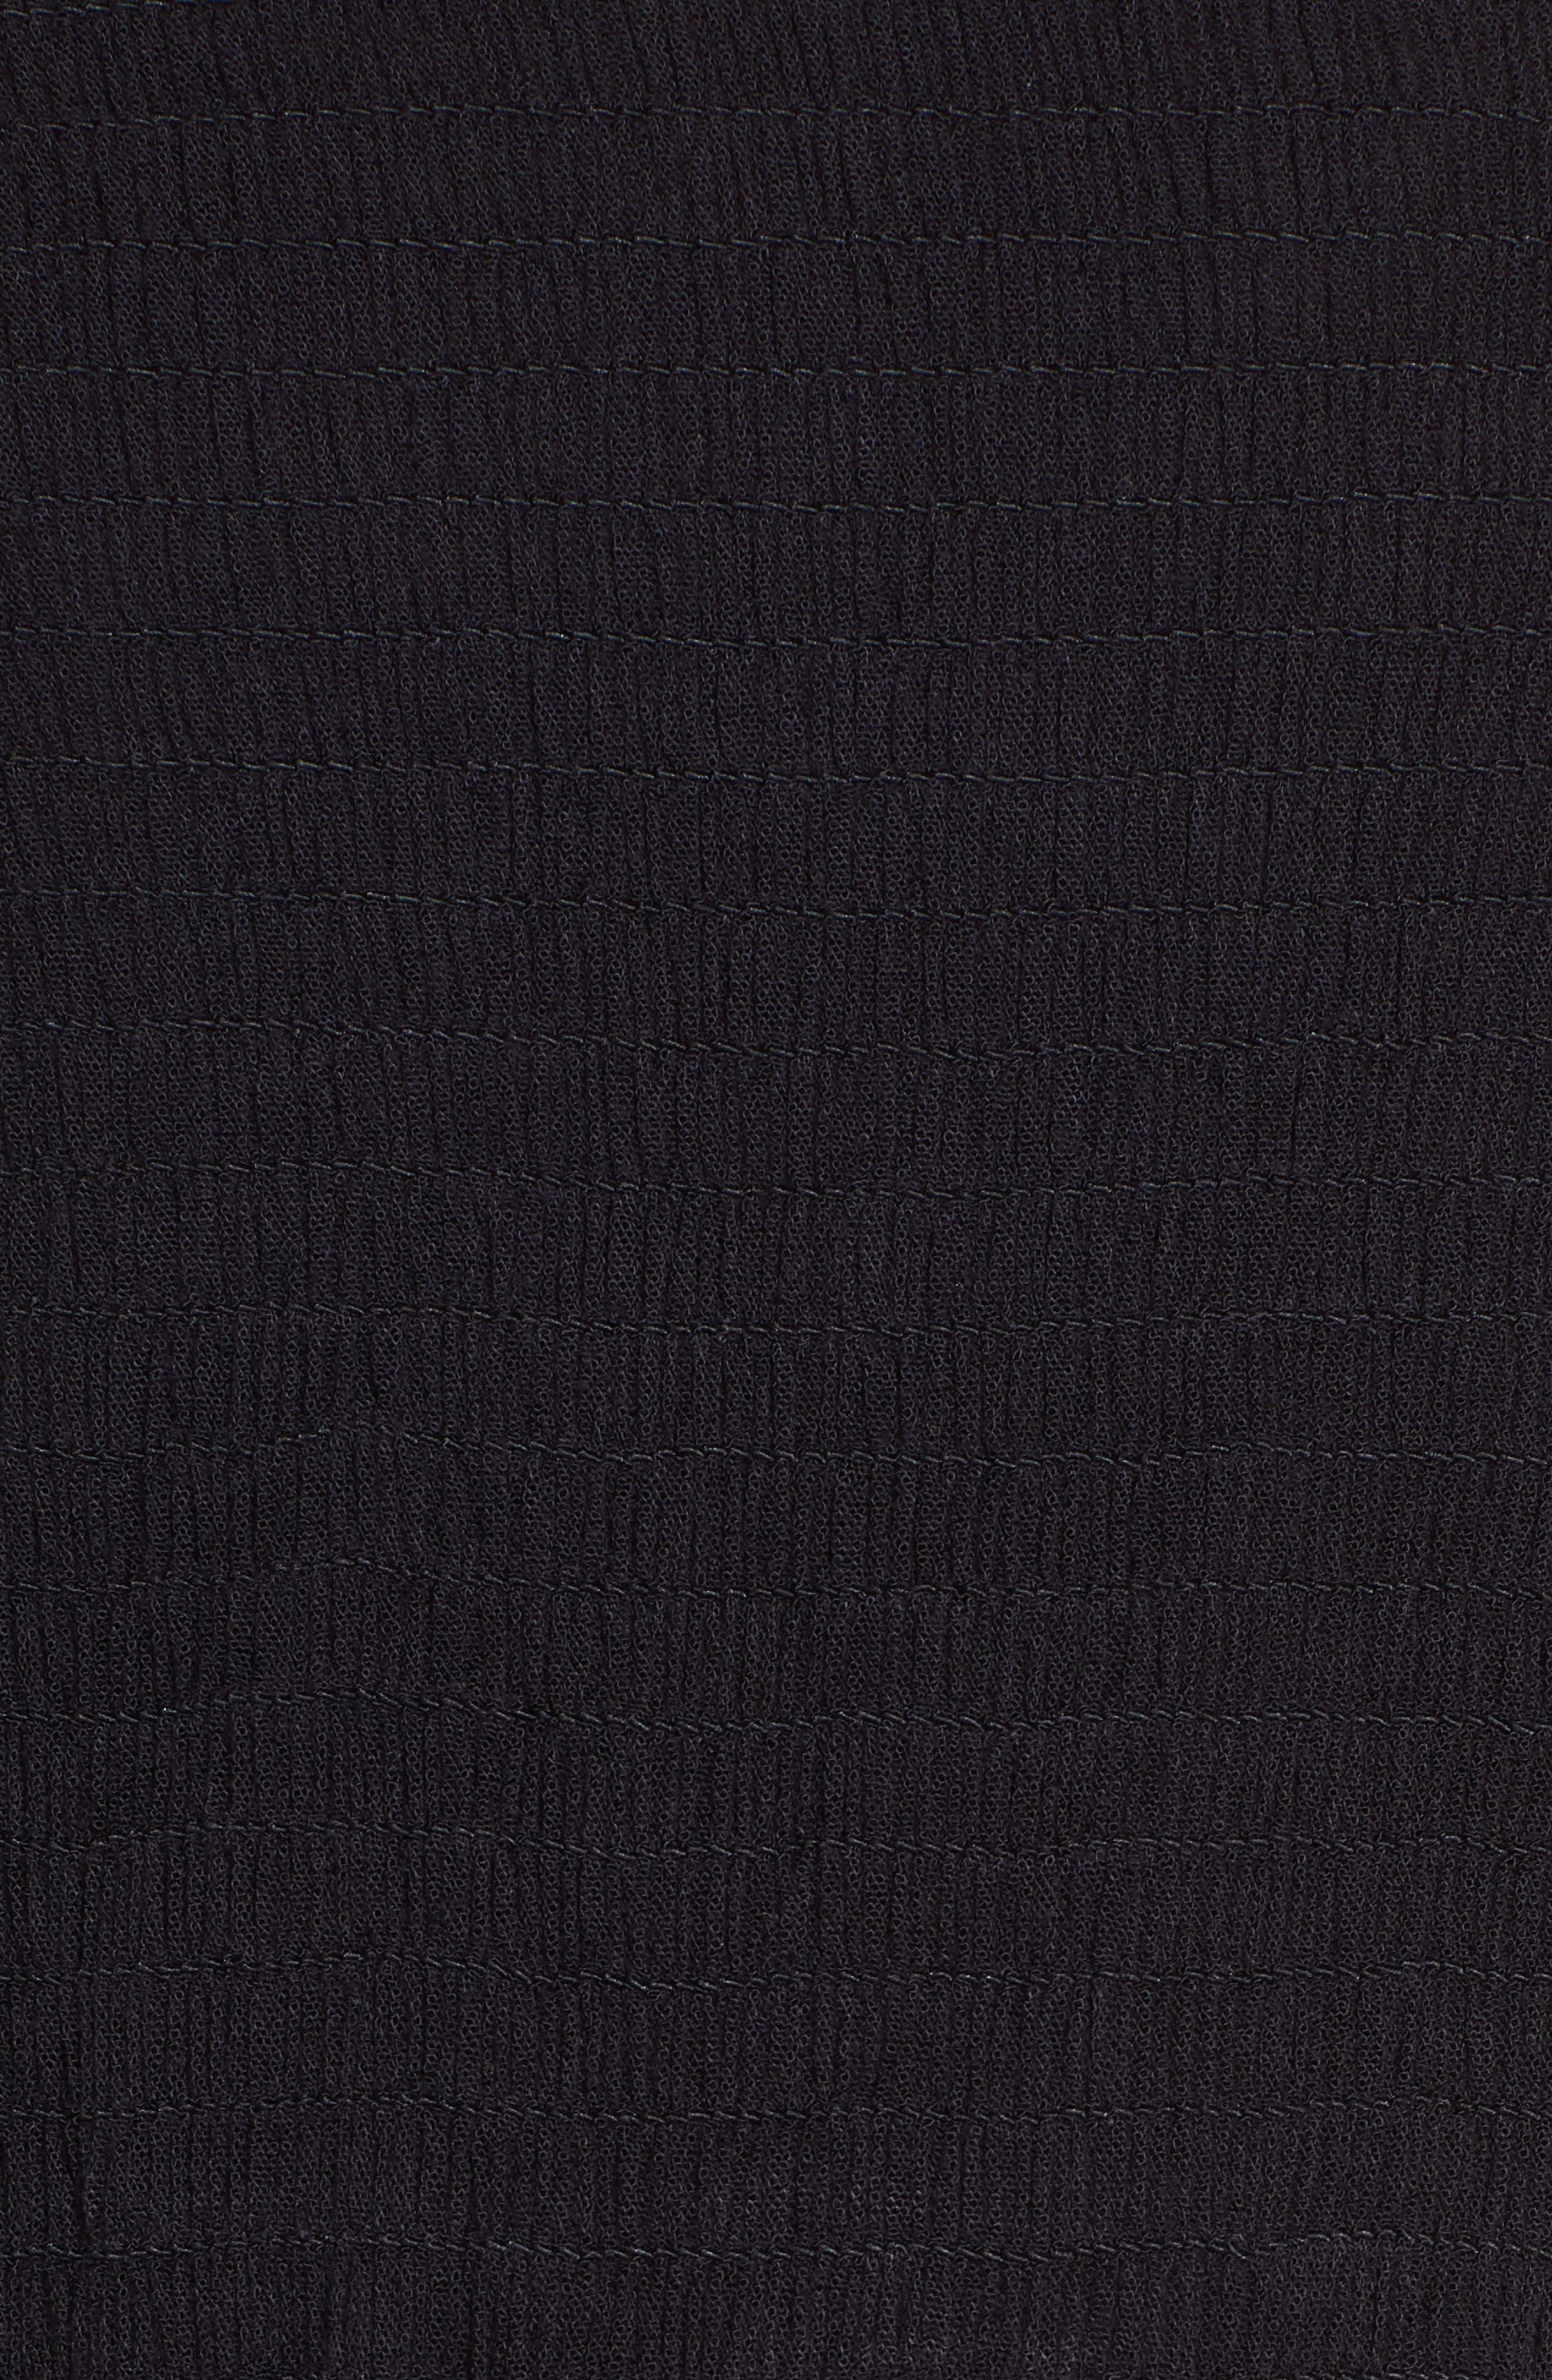 CHELSEA28, Farrah Smocked Cover-Up Maxi Dress, Alternate thumbnail 6, color, BLACK